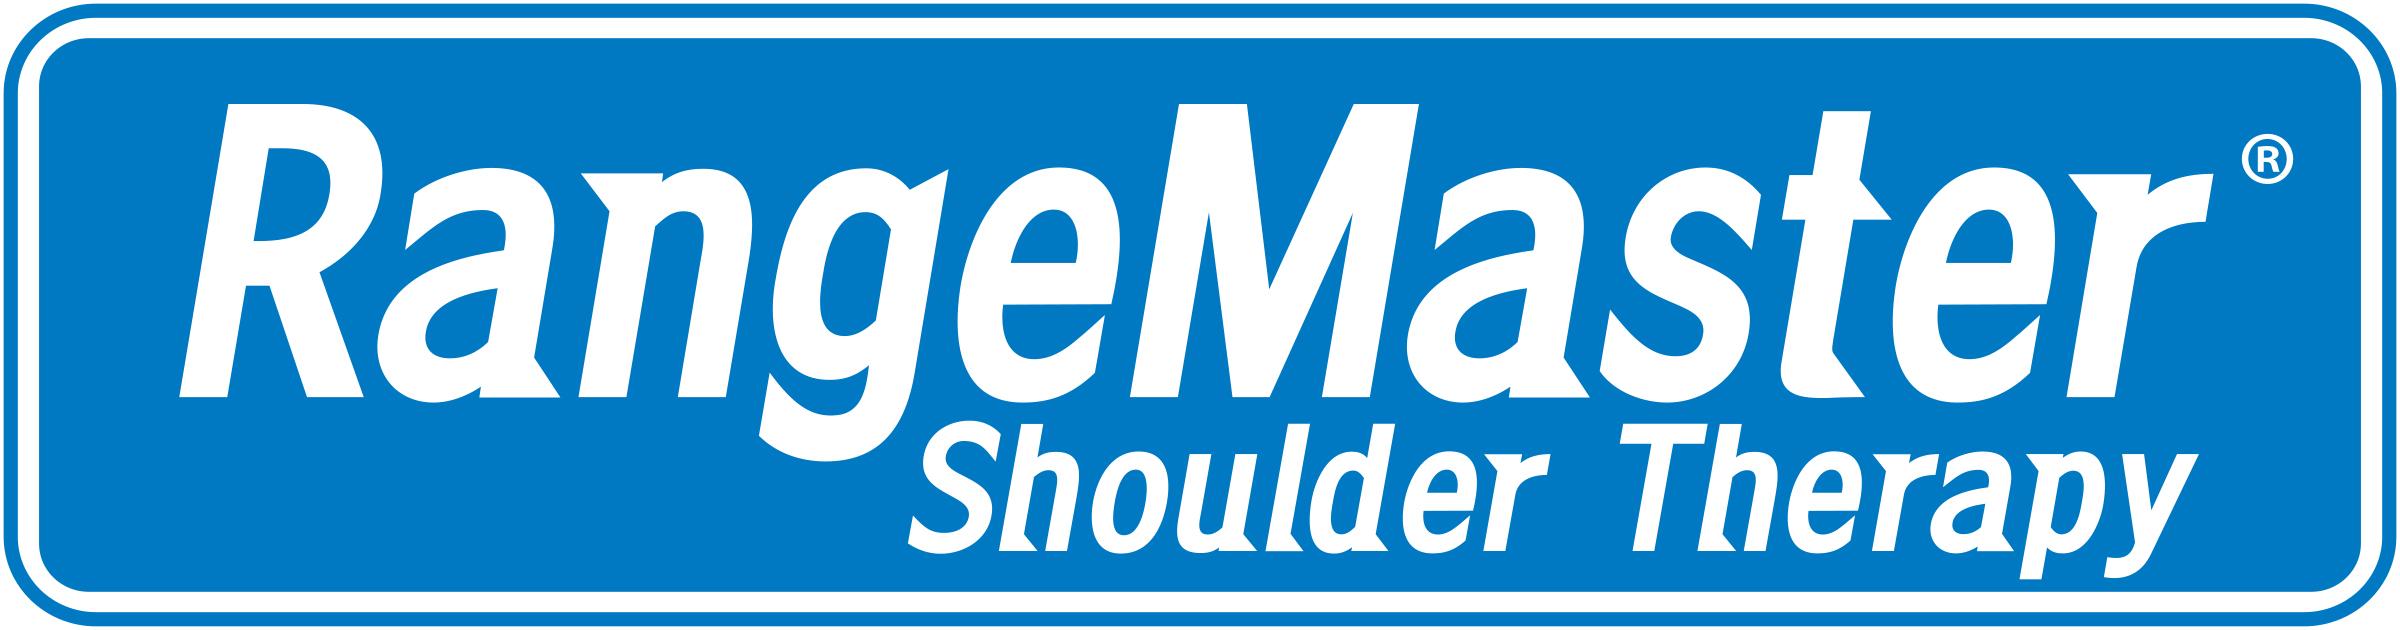 RM_ShoulderTherapy_Logo_r.jpg